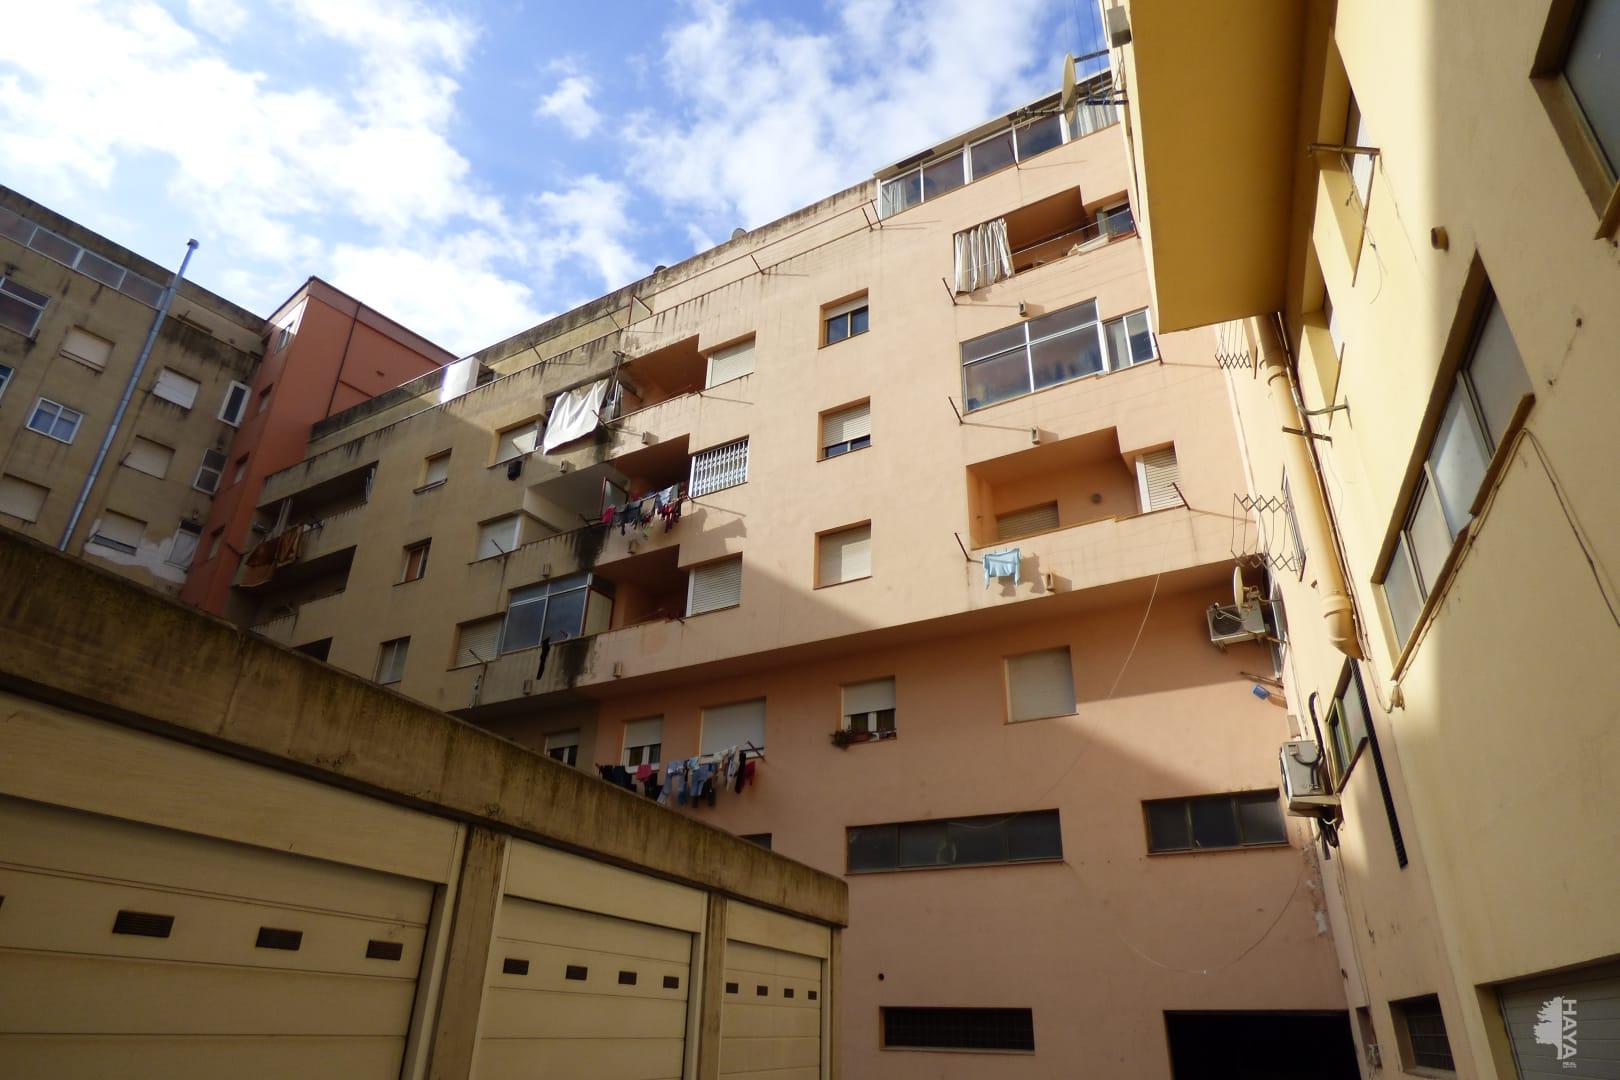 Piso en venta en Salt, Girona, Calle Anselm Clave, 50.383 €, 3 habitaciones, 1 baño, 74 m2